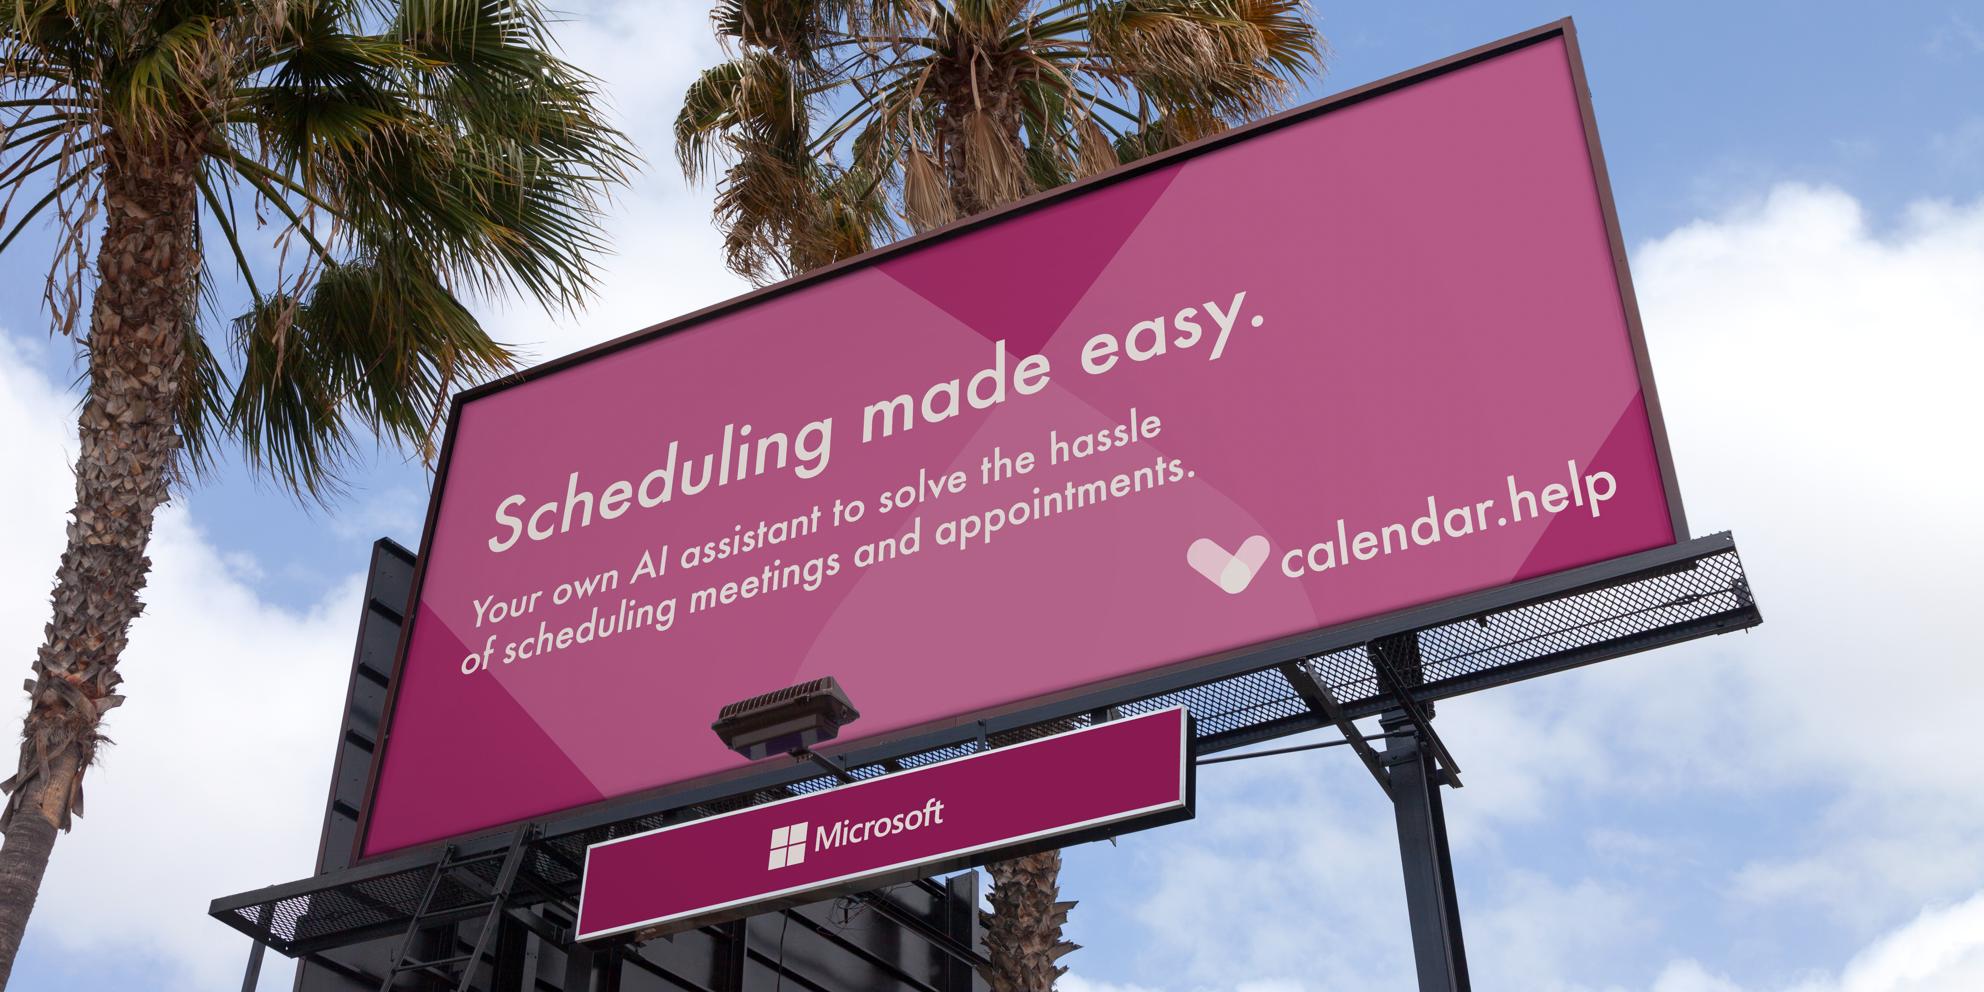 calendar_help_app_billbard.png